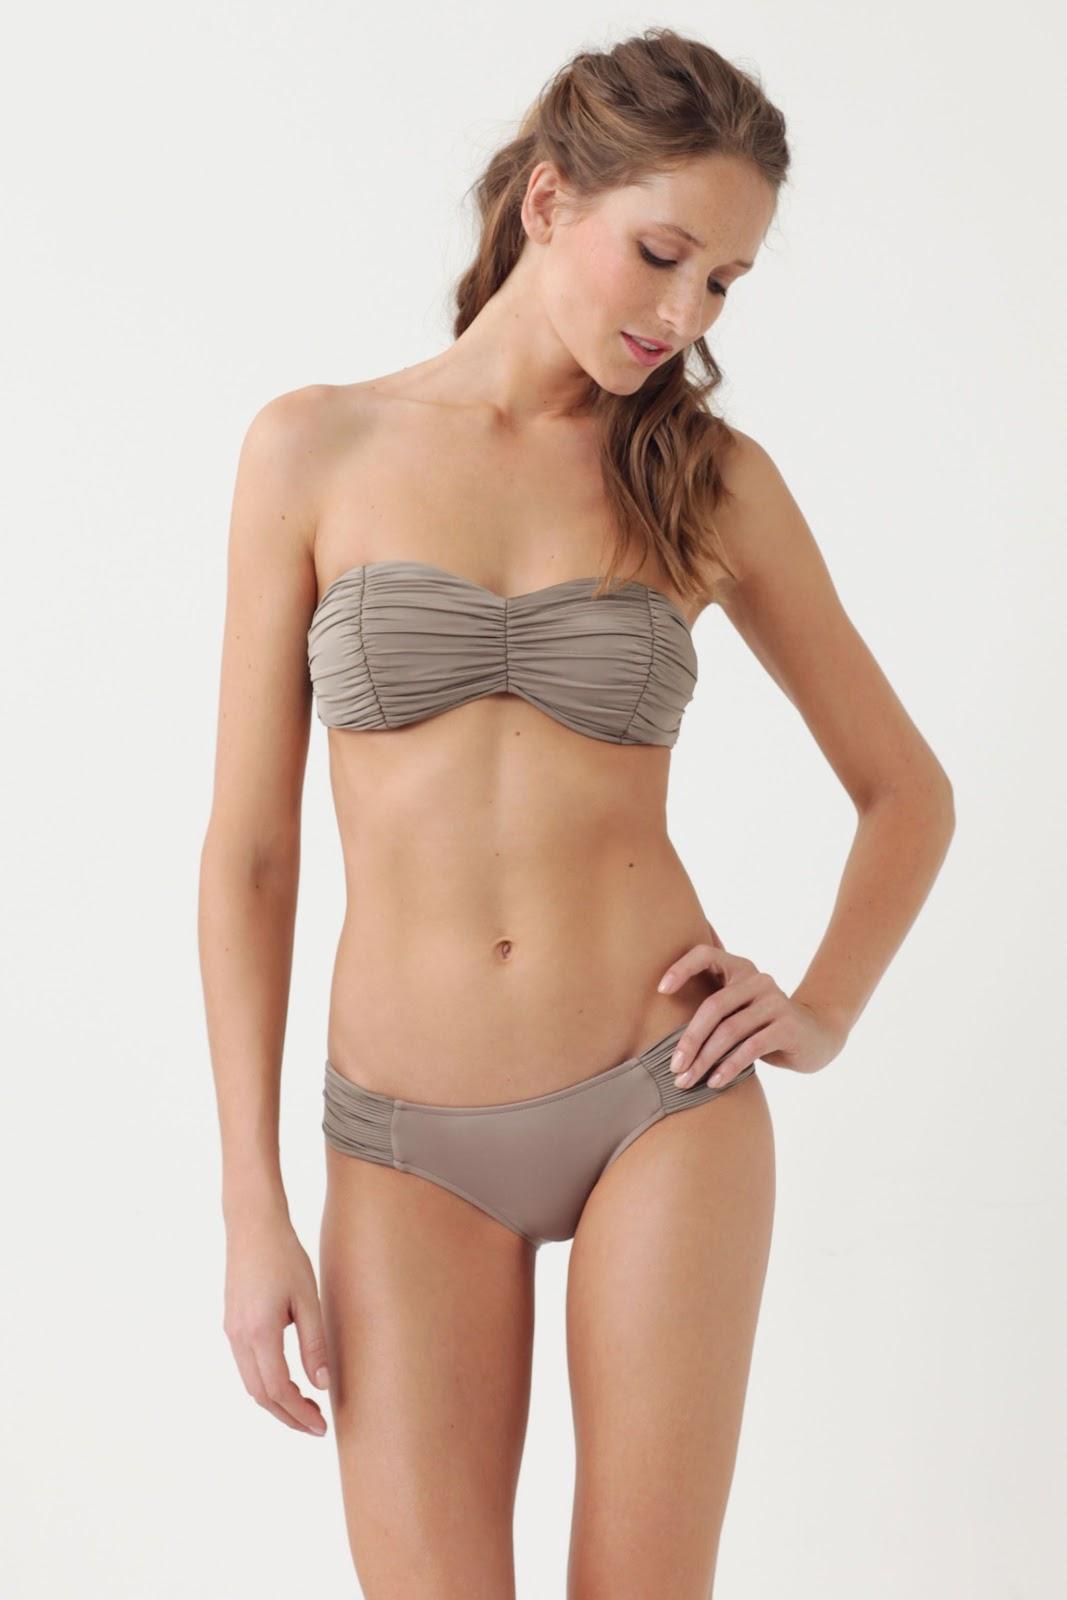 http://1.bp.blogspot.com/-trdBYQ6Nppg/TwFLugqngEI/AAAAAAAAI9g/X_84-8rYIF8/s1600/bikini+trend_22.jpg